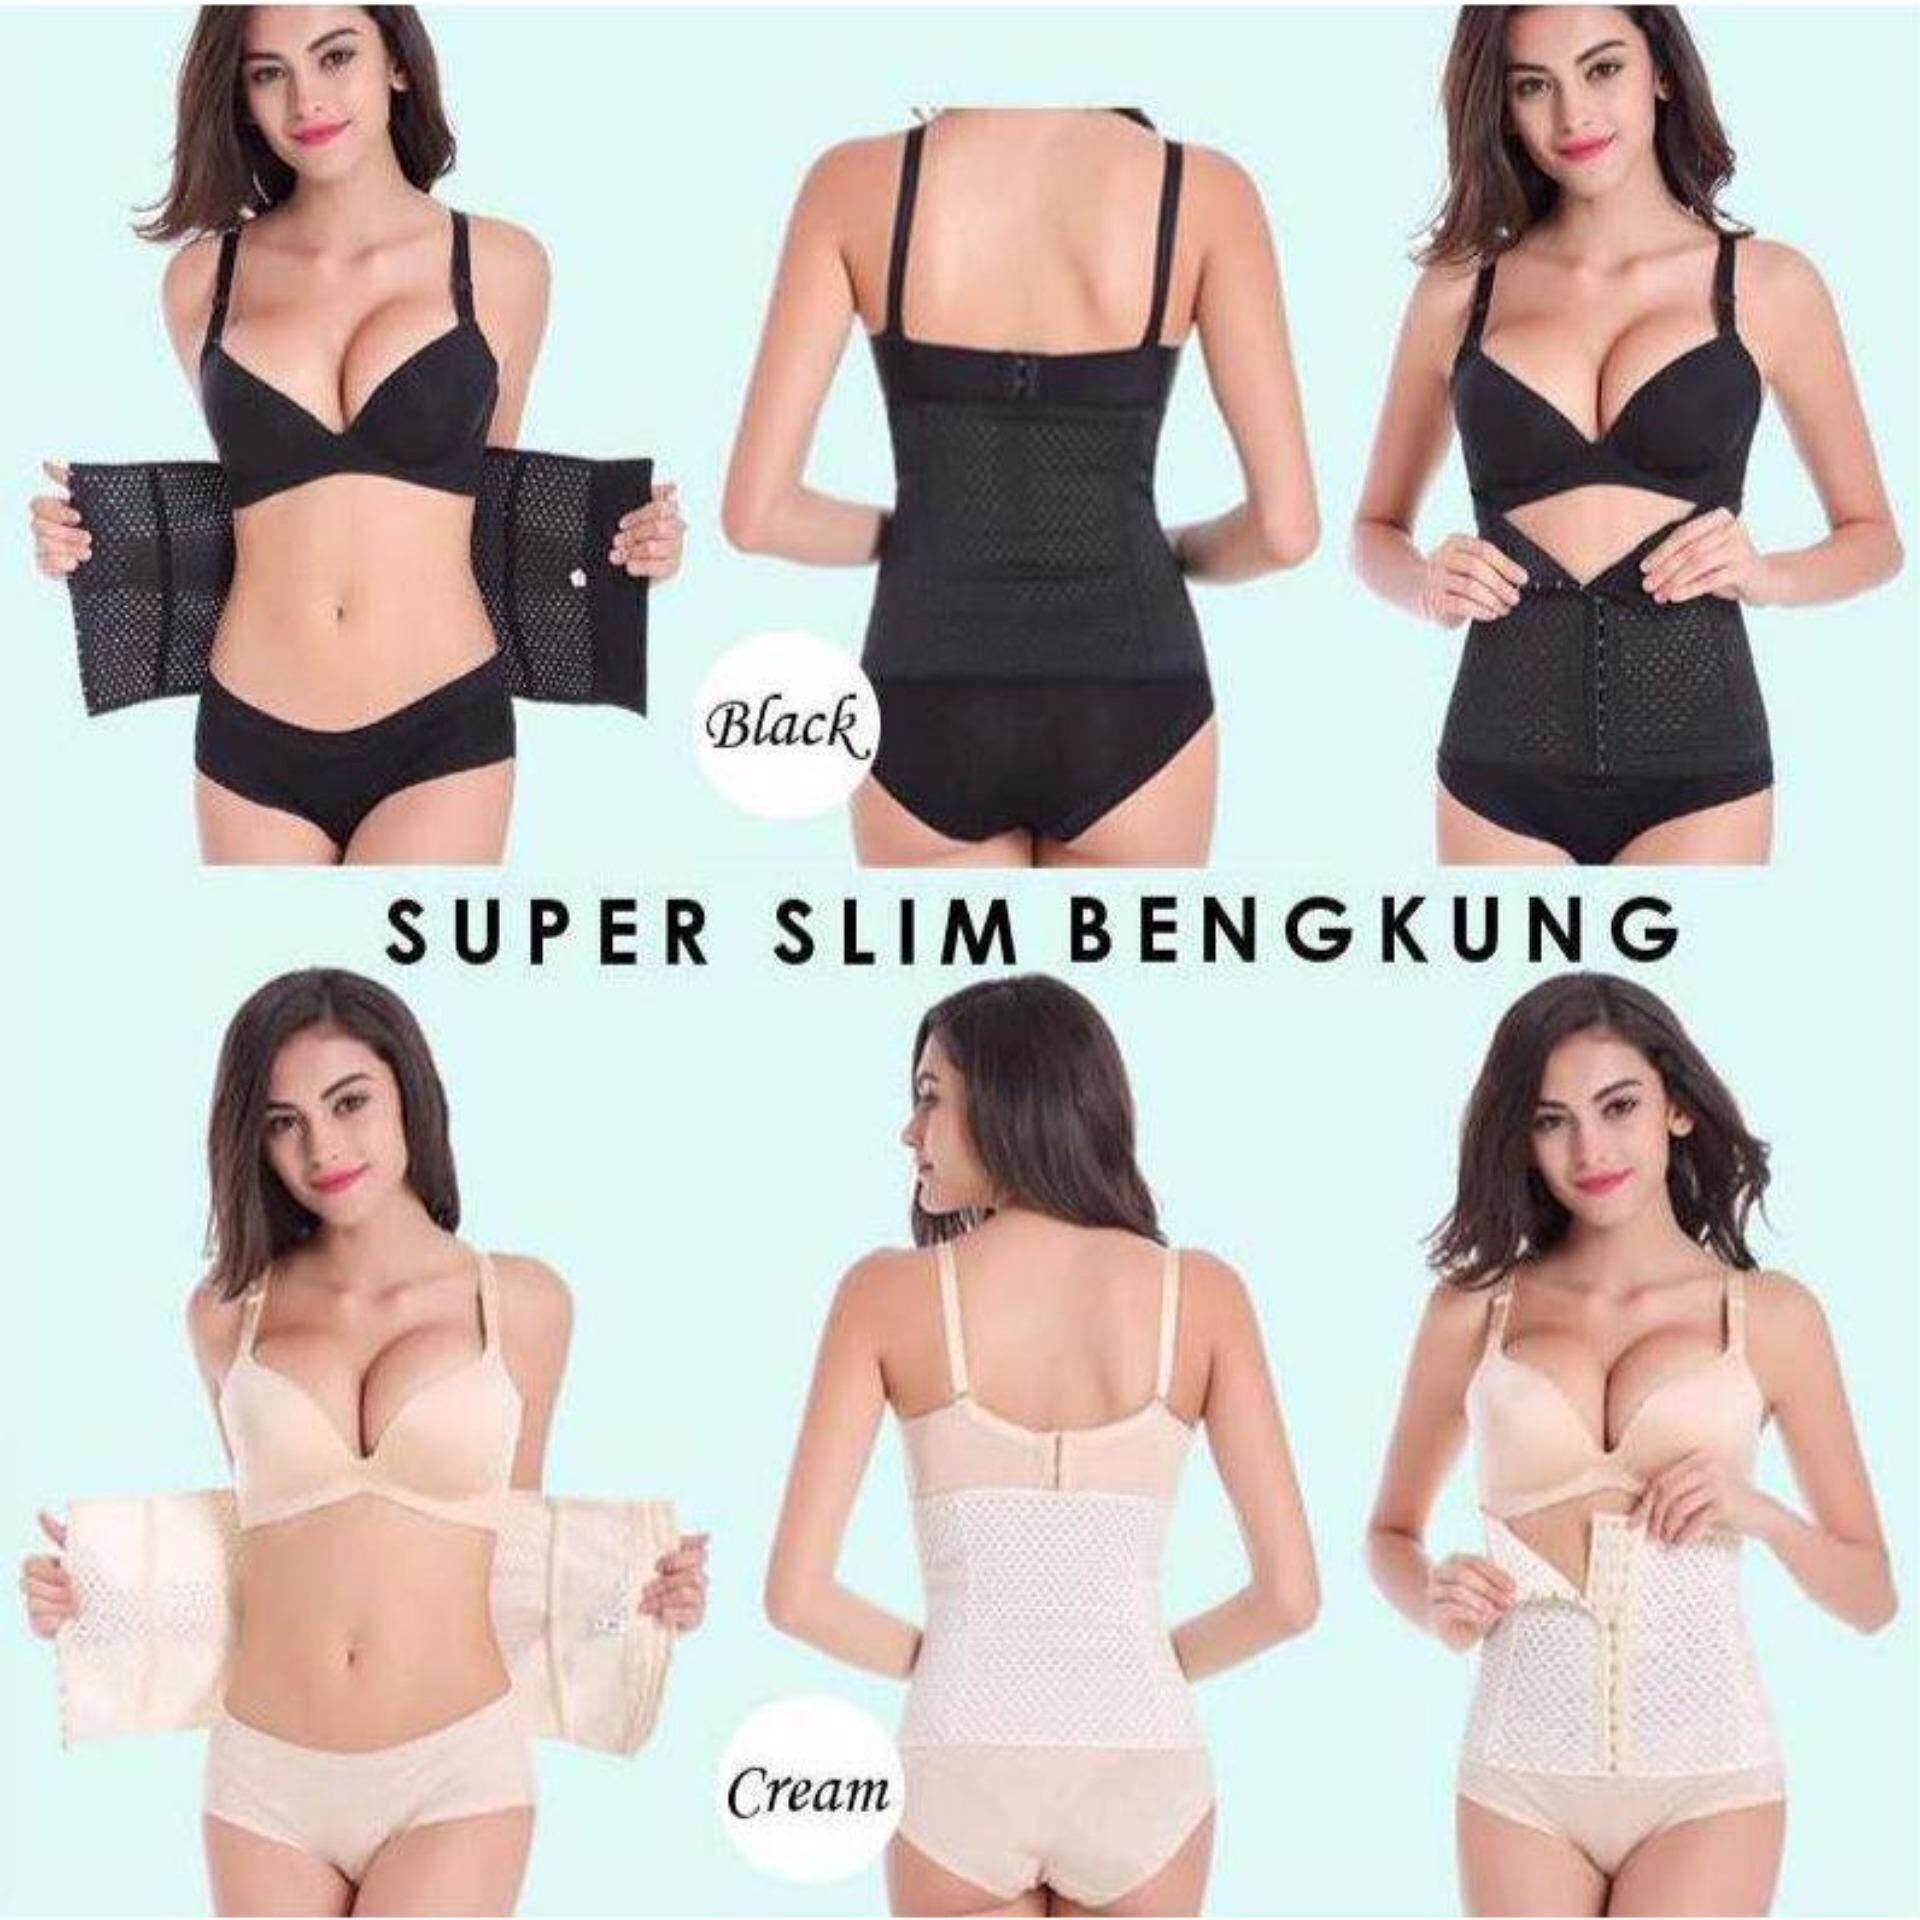 [READY STOCK] Bengkung / Slimming Corset /Slimming Belt/ Waist Trainer